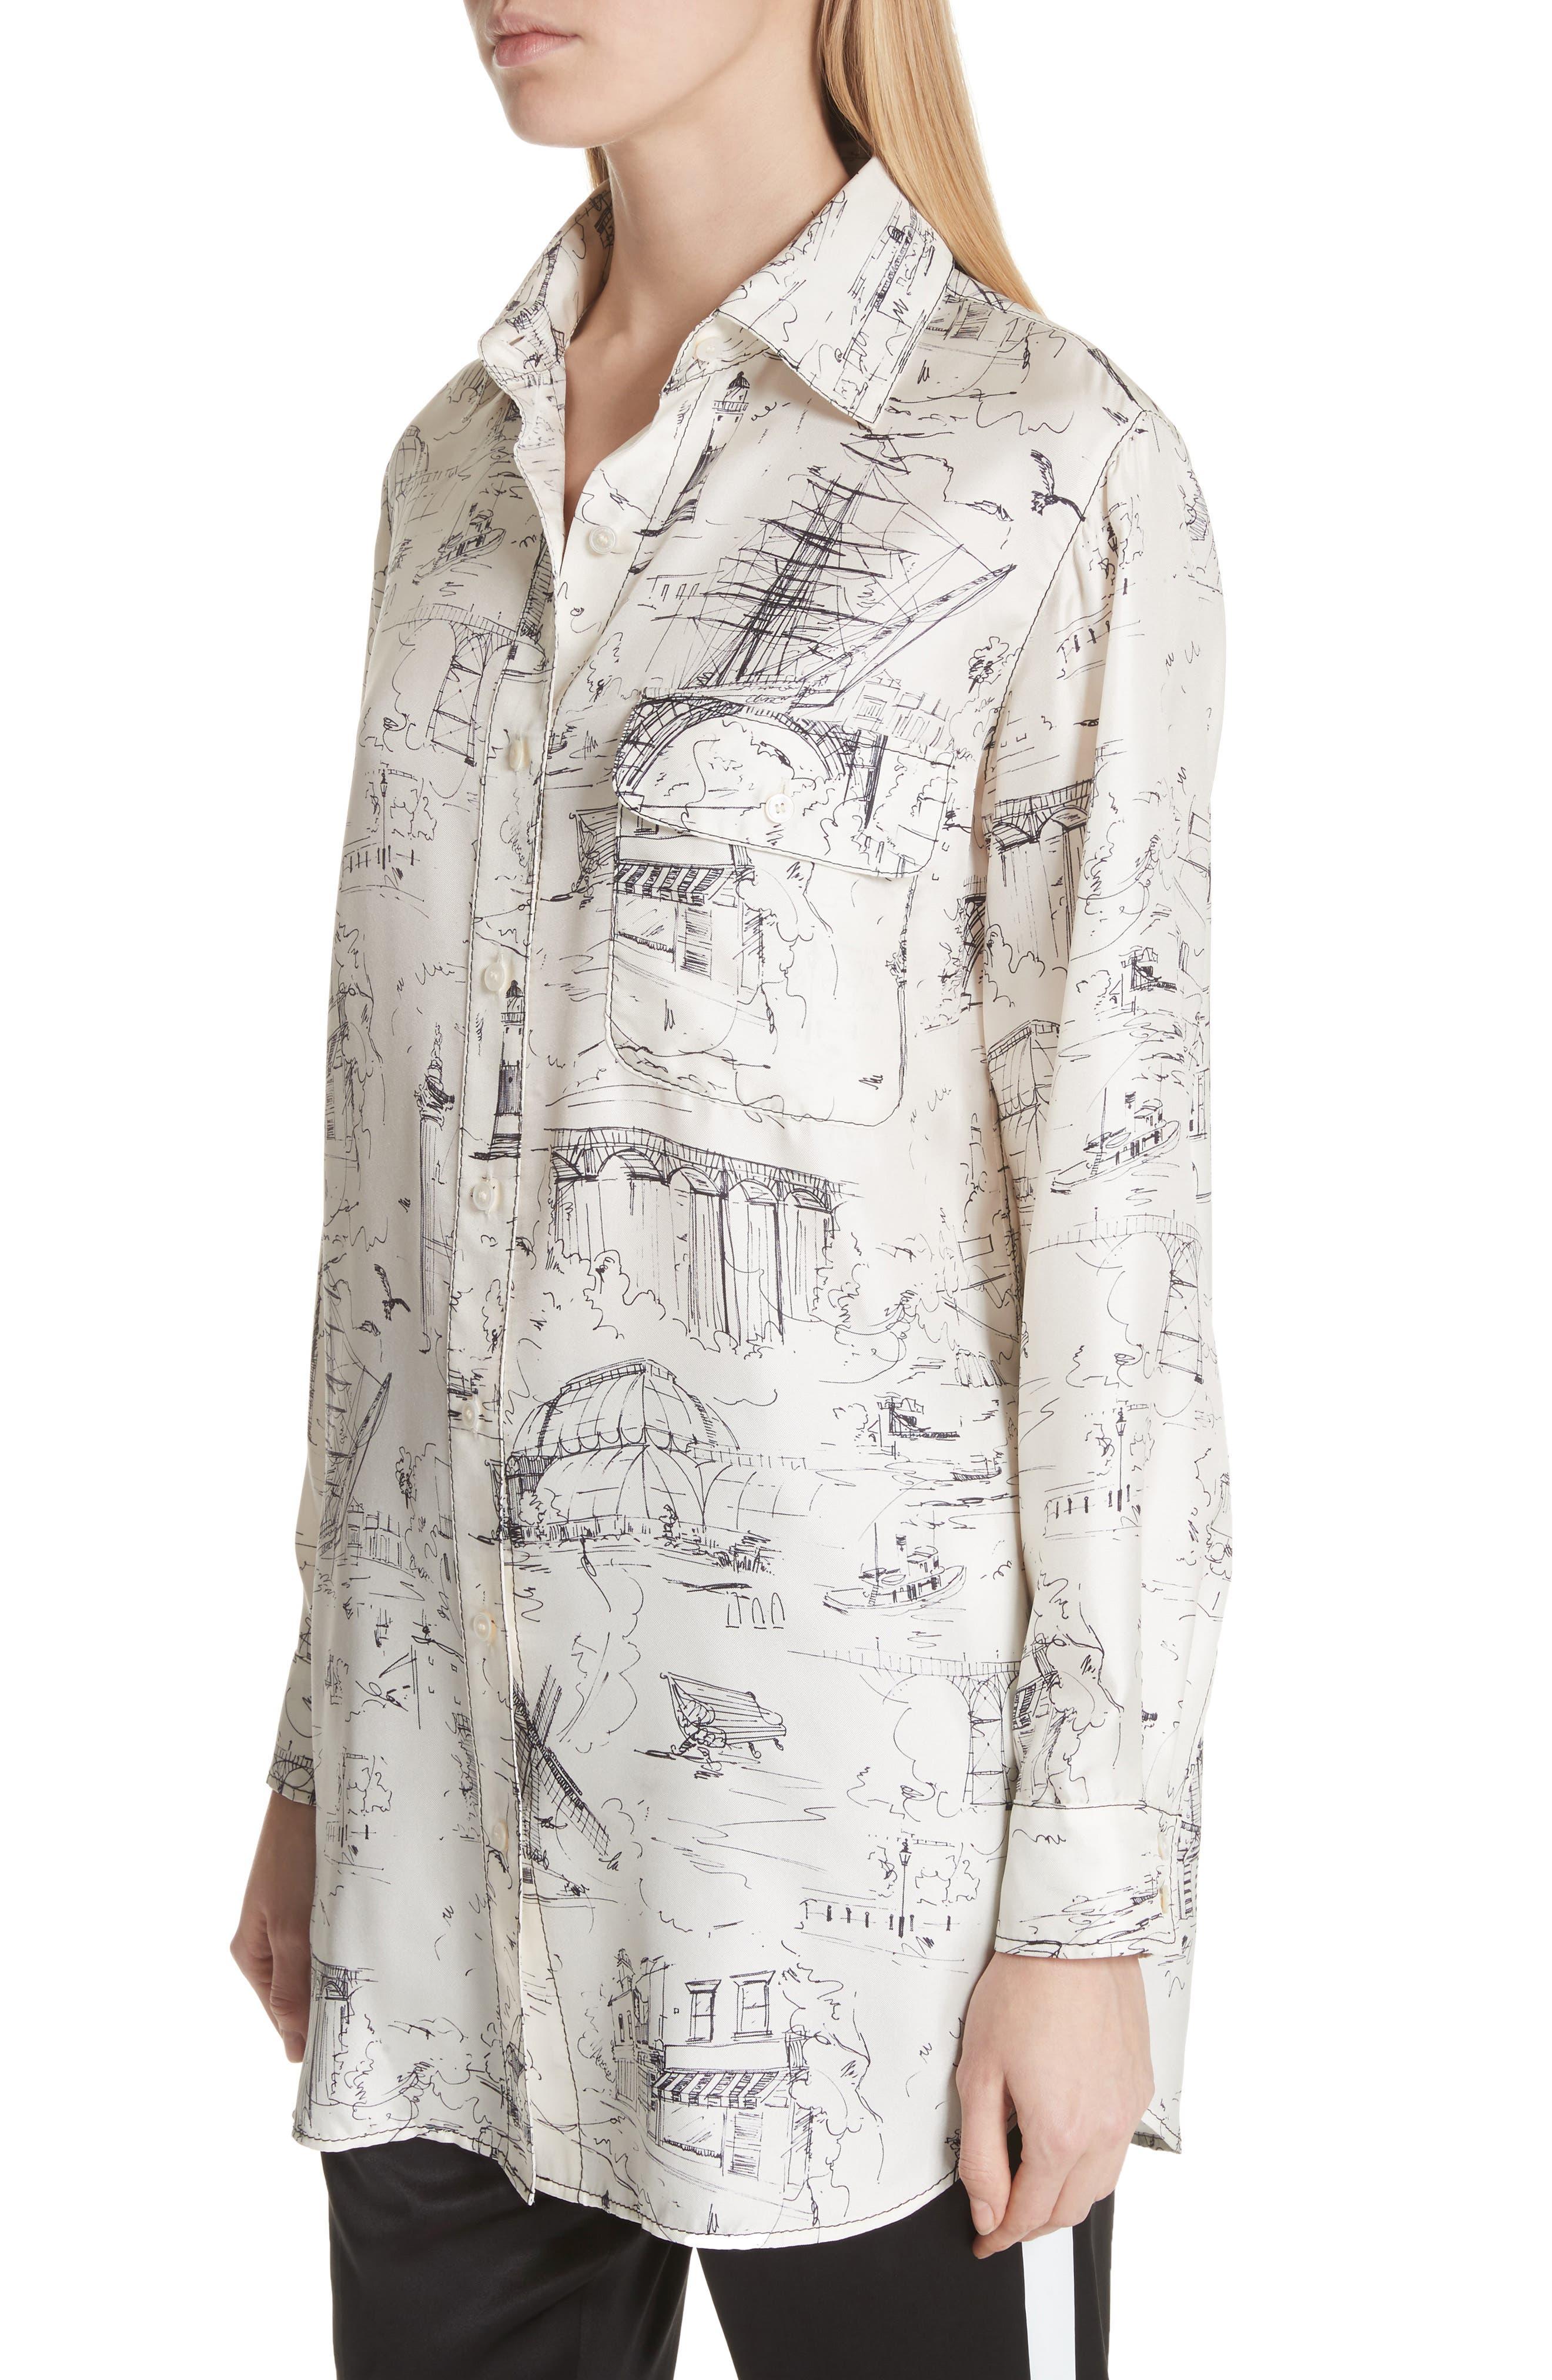 Chava Sketch Silk Shirt,                             Alternate thumbnail 4, color,                             Off White